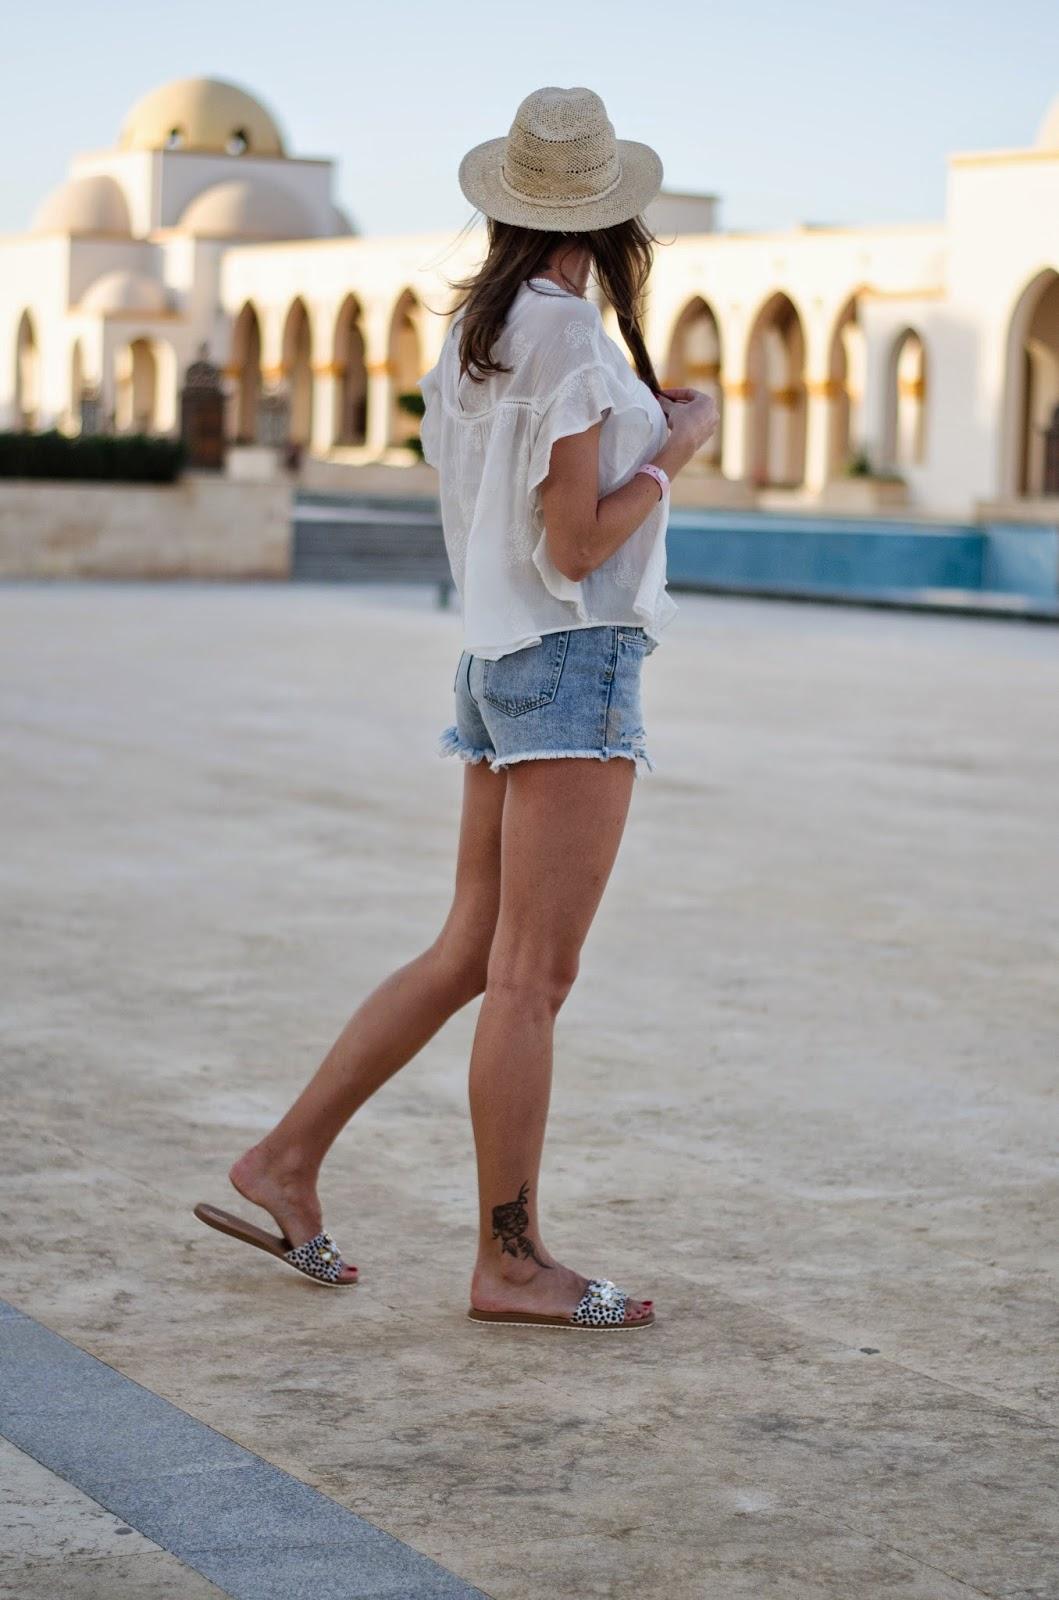 kristjaana mere sahl hasheesh white top blue jeans summer outfit